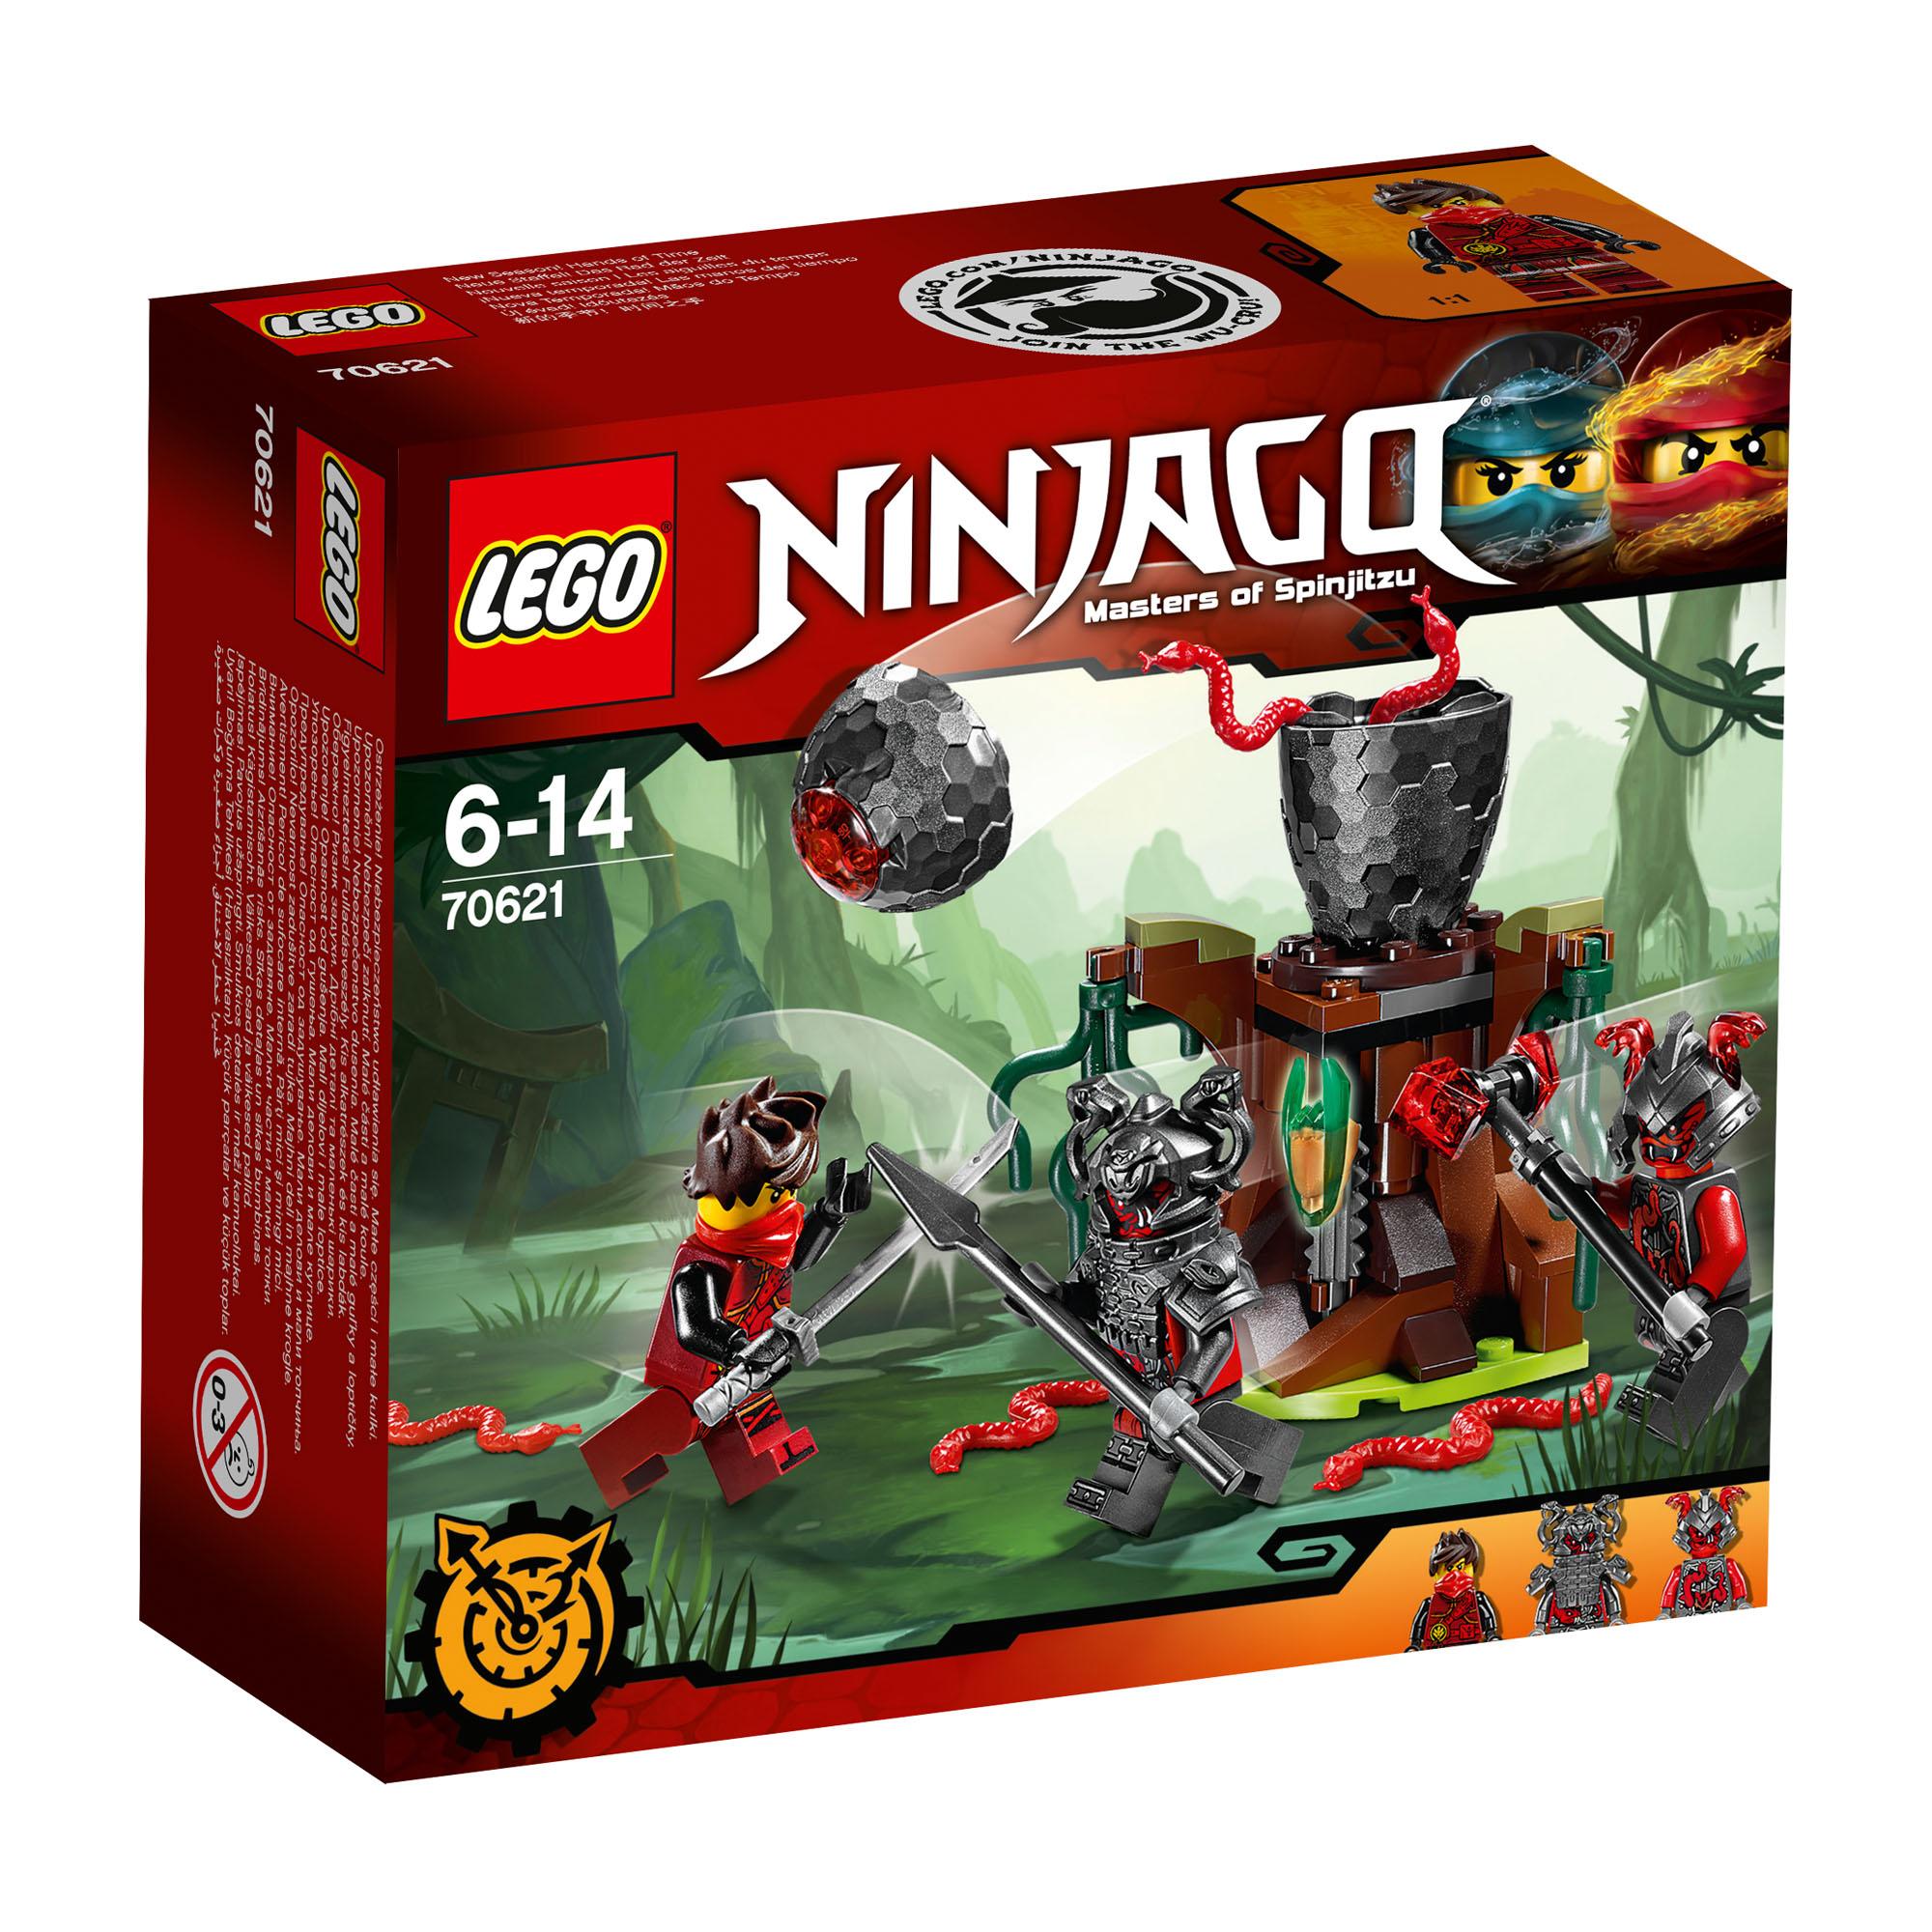 70621 lego ninjago the vermillion attack 83 pieces age 6 14 new release for 2017 ebay - Lego ninjago 6 ...